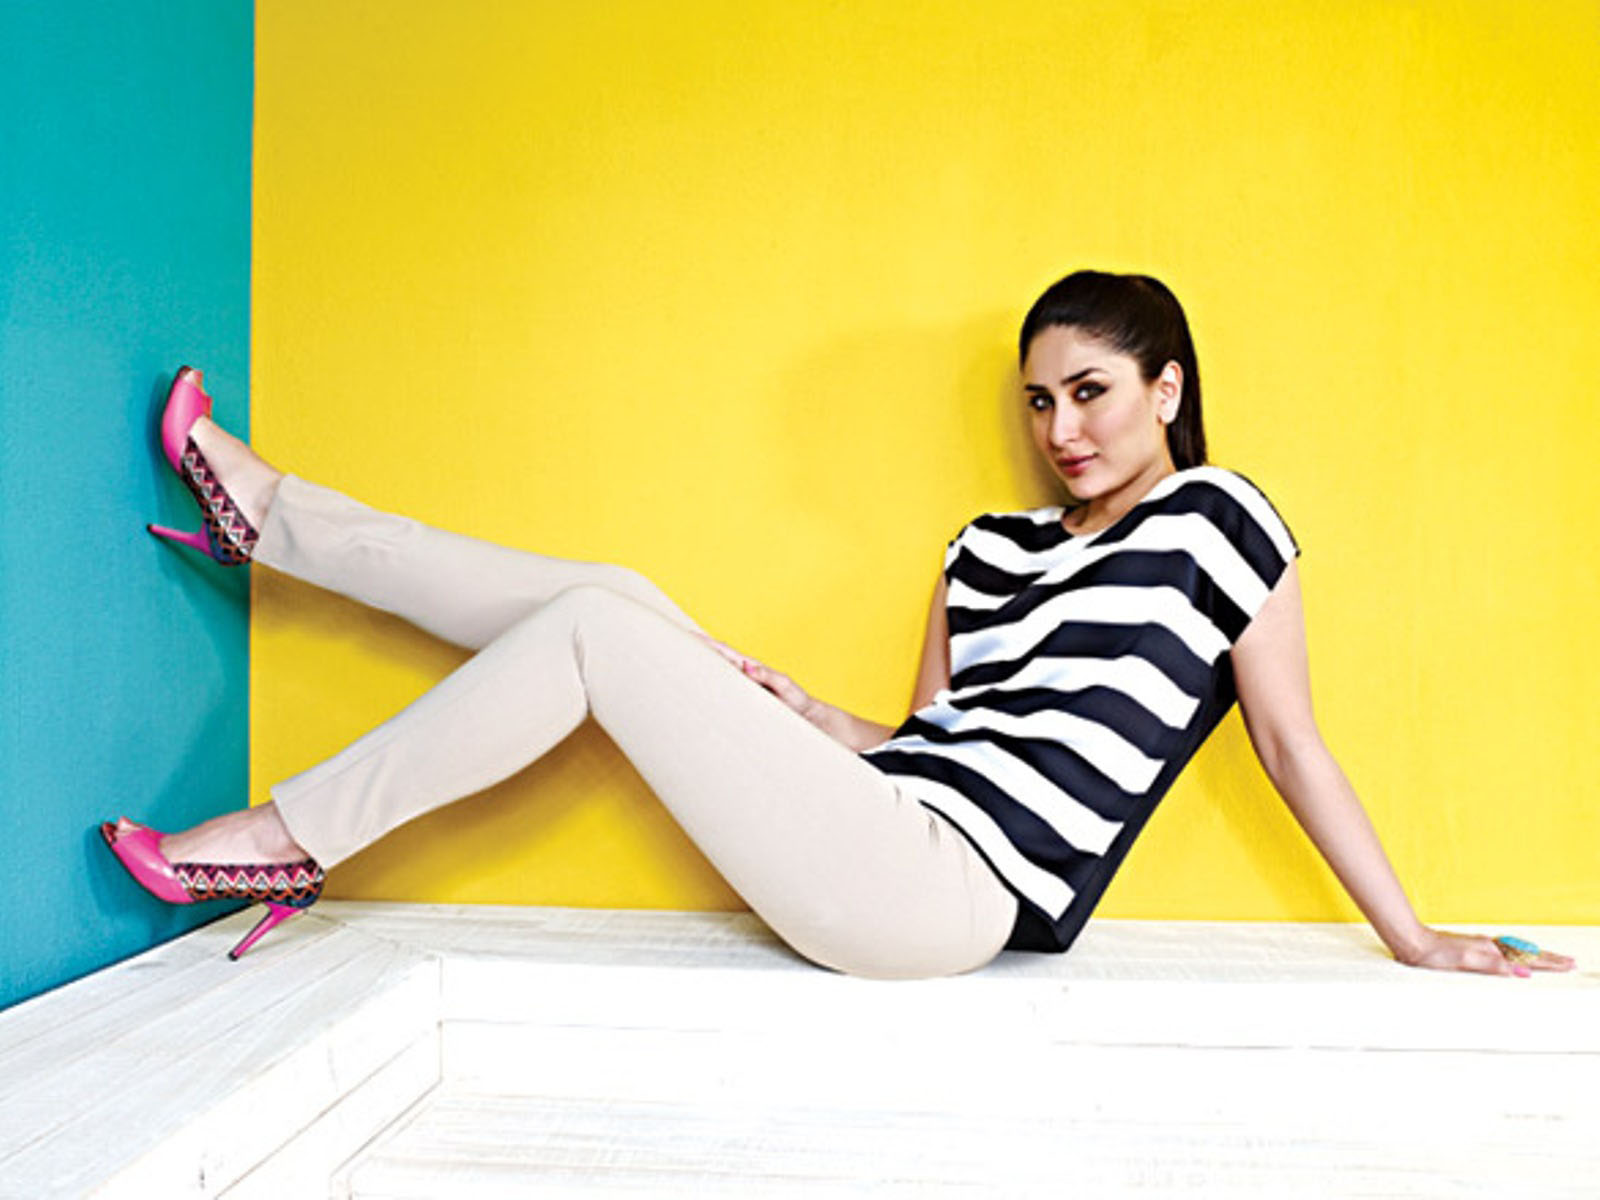 Latest Hd Wallpapers Of Hot Kareena Kapoor 2015   Full HD Wallpaper 1600x1200